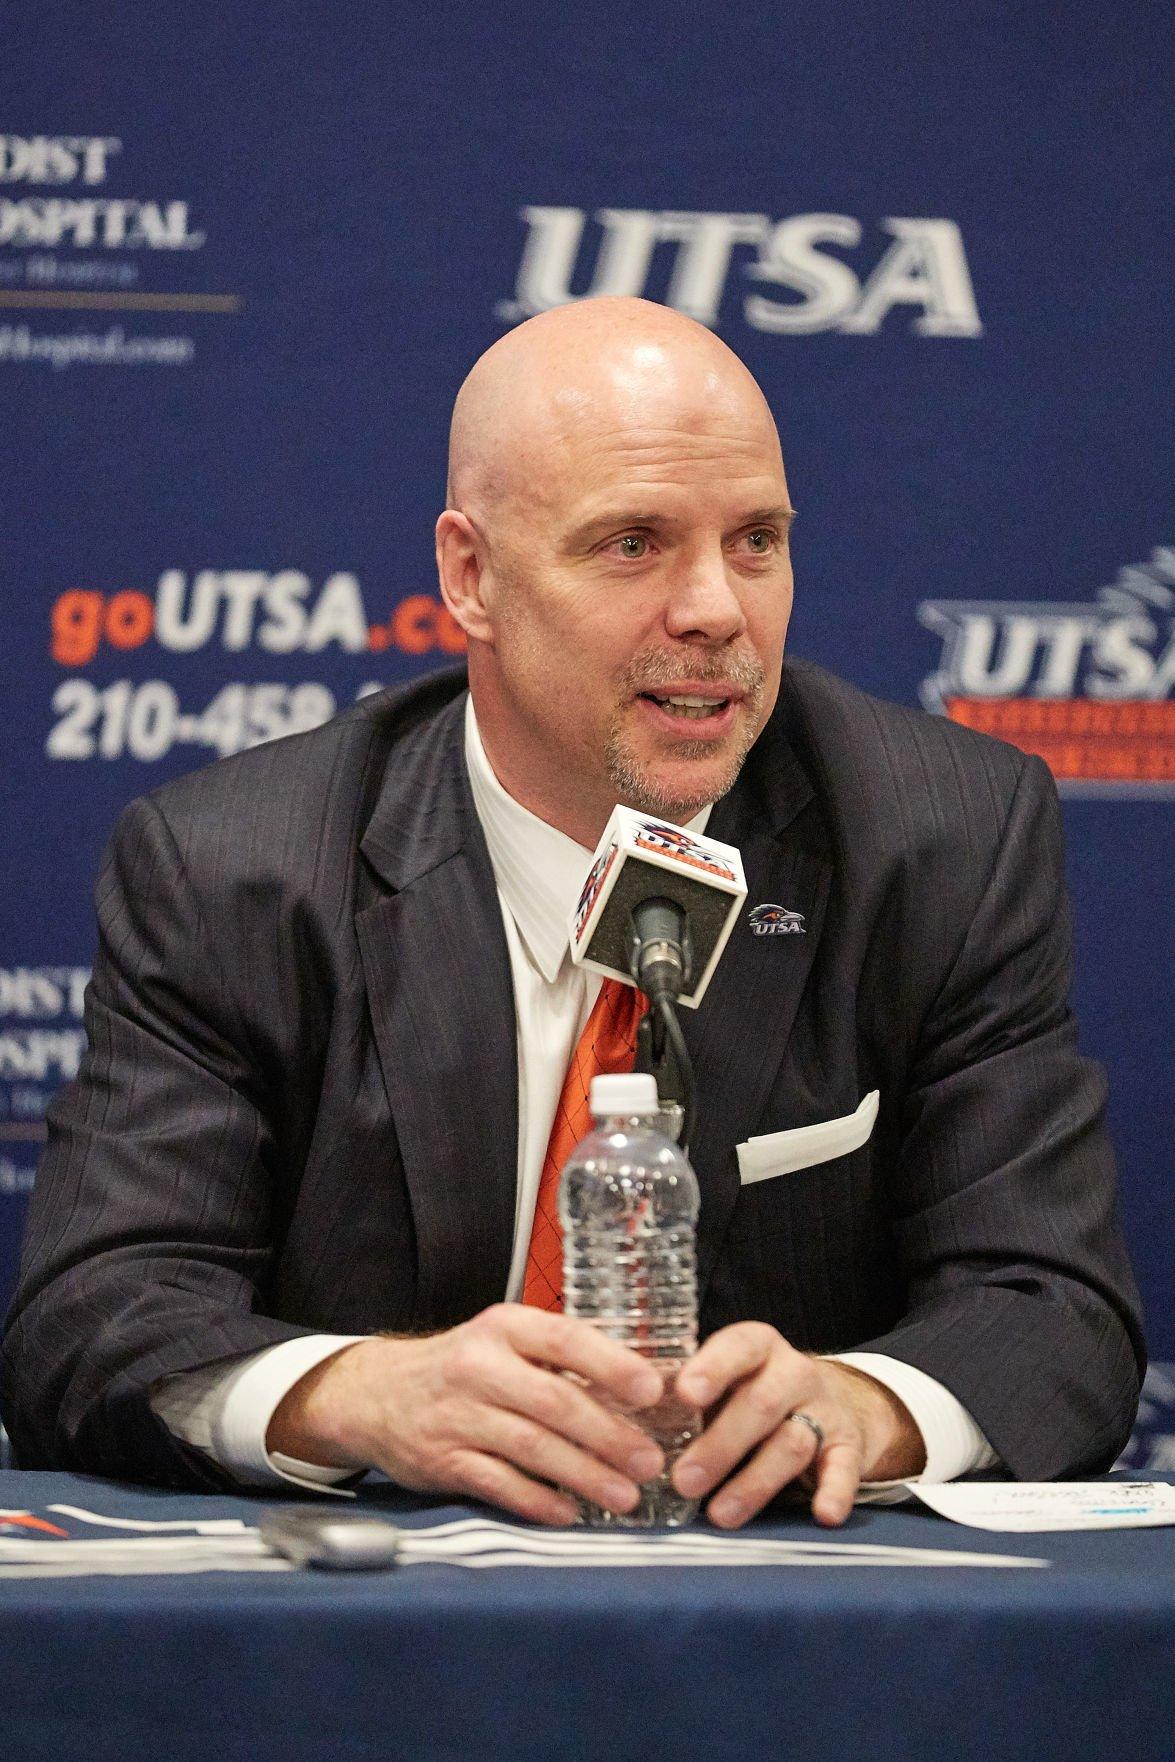 UTSA Men's Basketball Head Coach Steve Henson Introduction